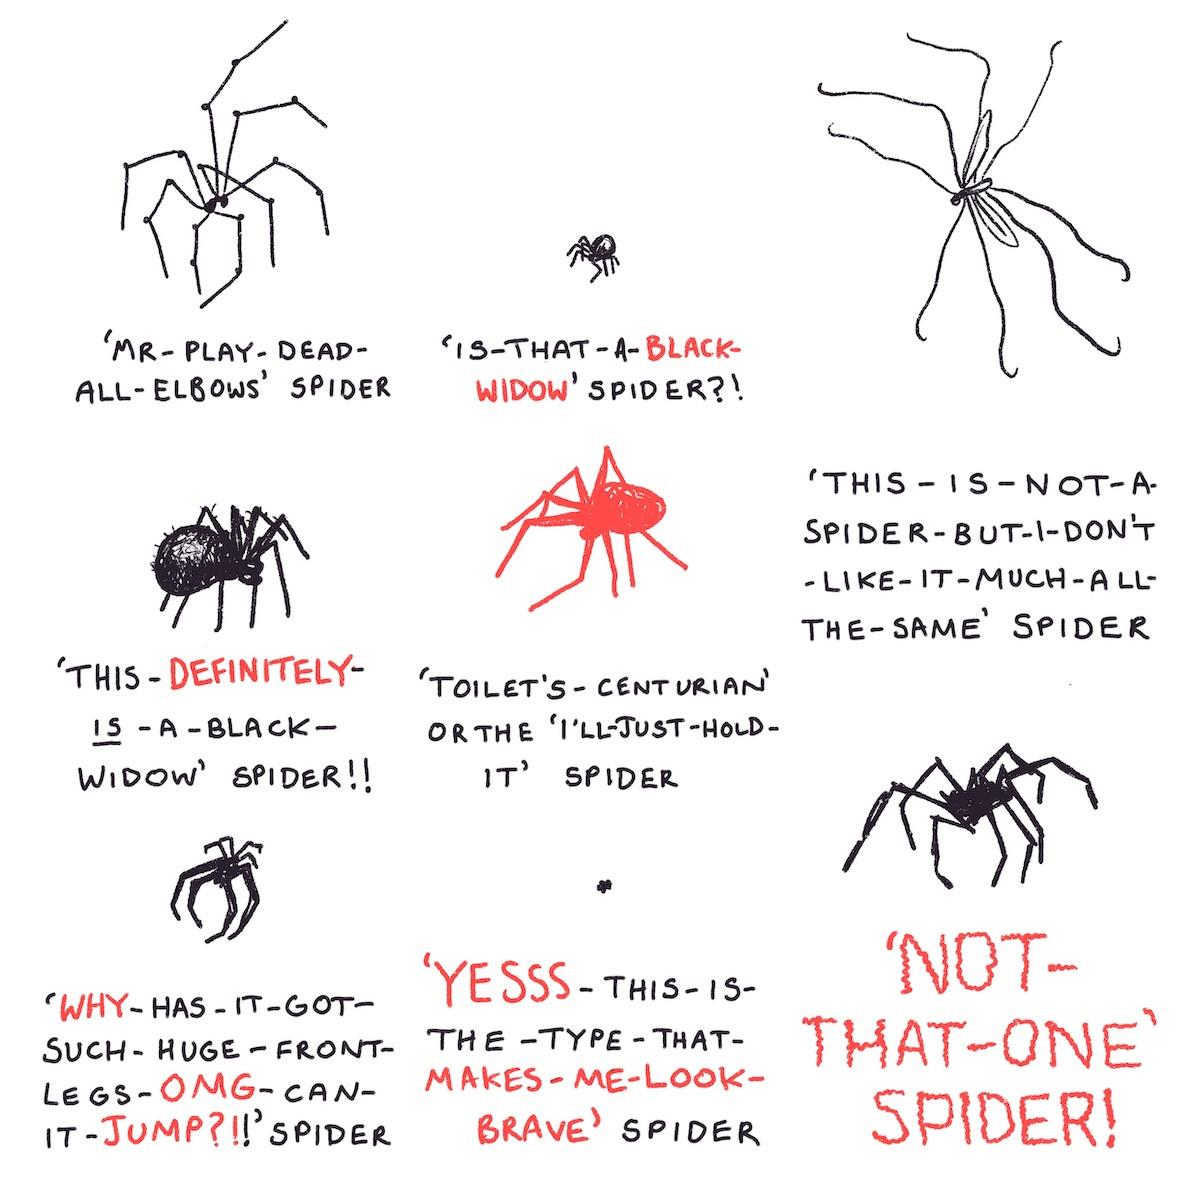 Spiderggeadon